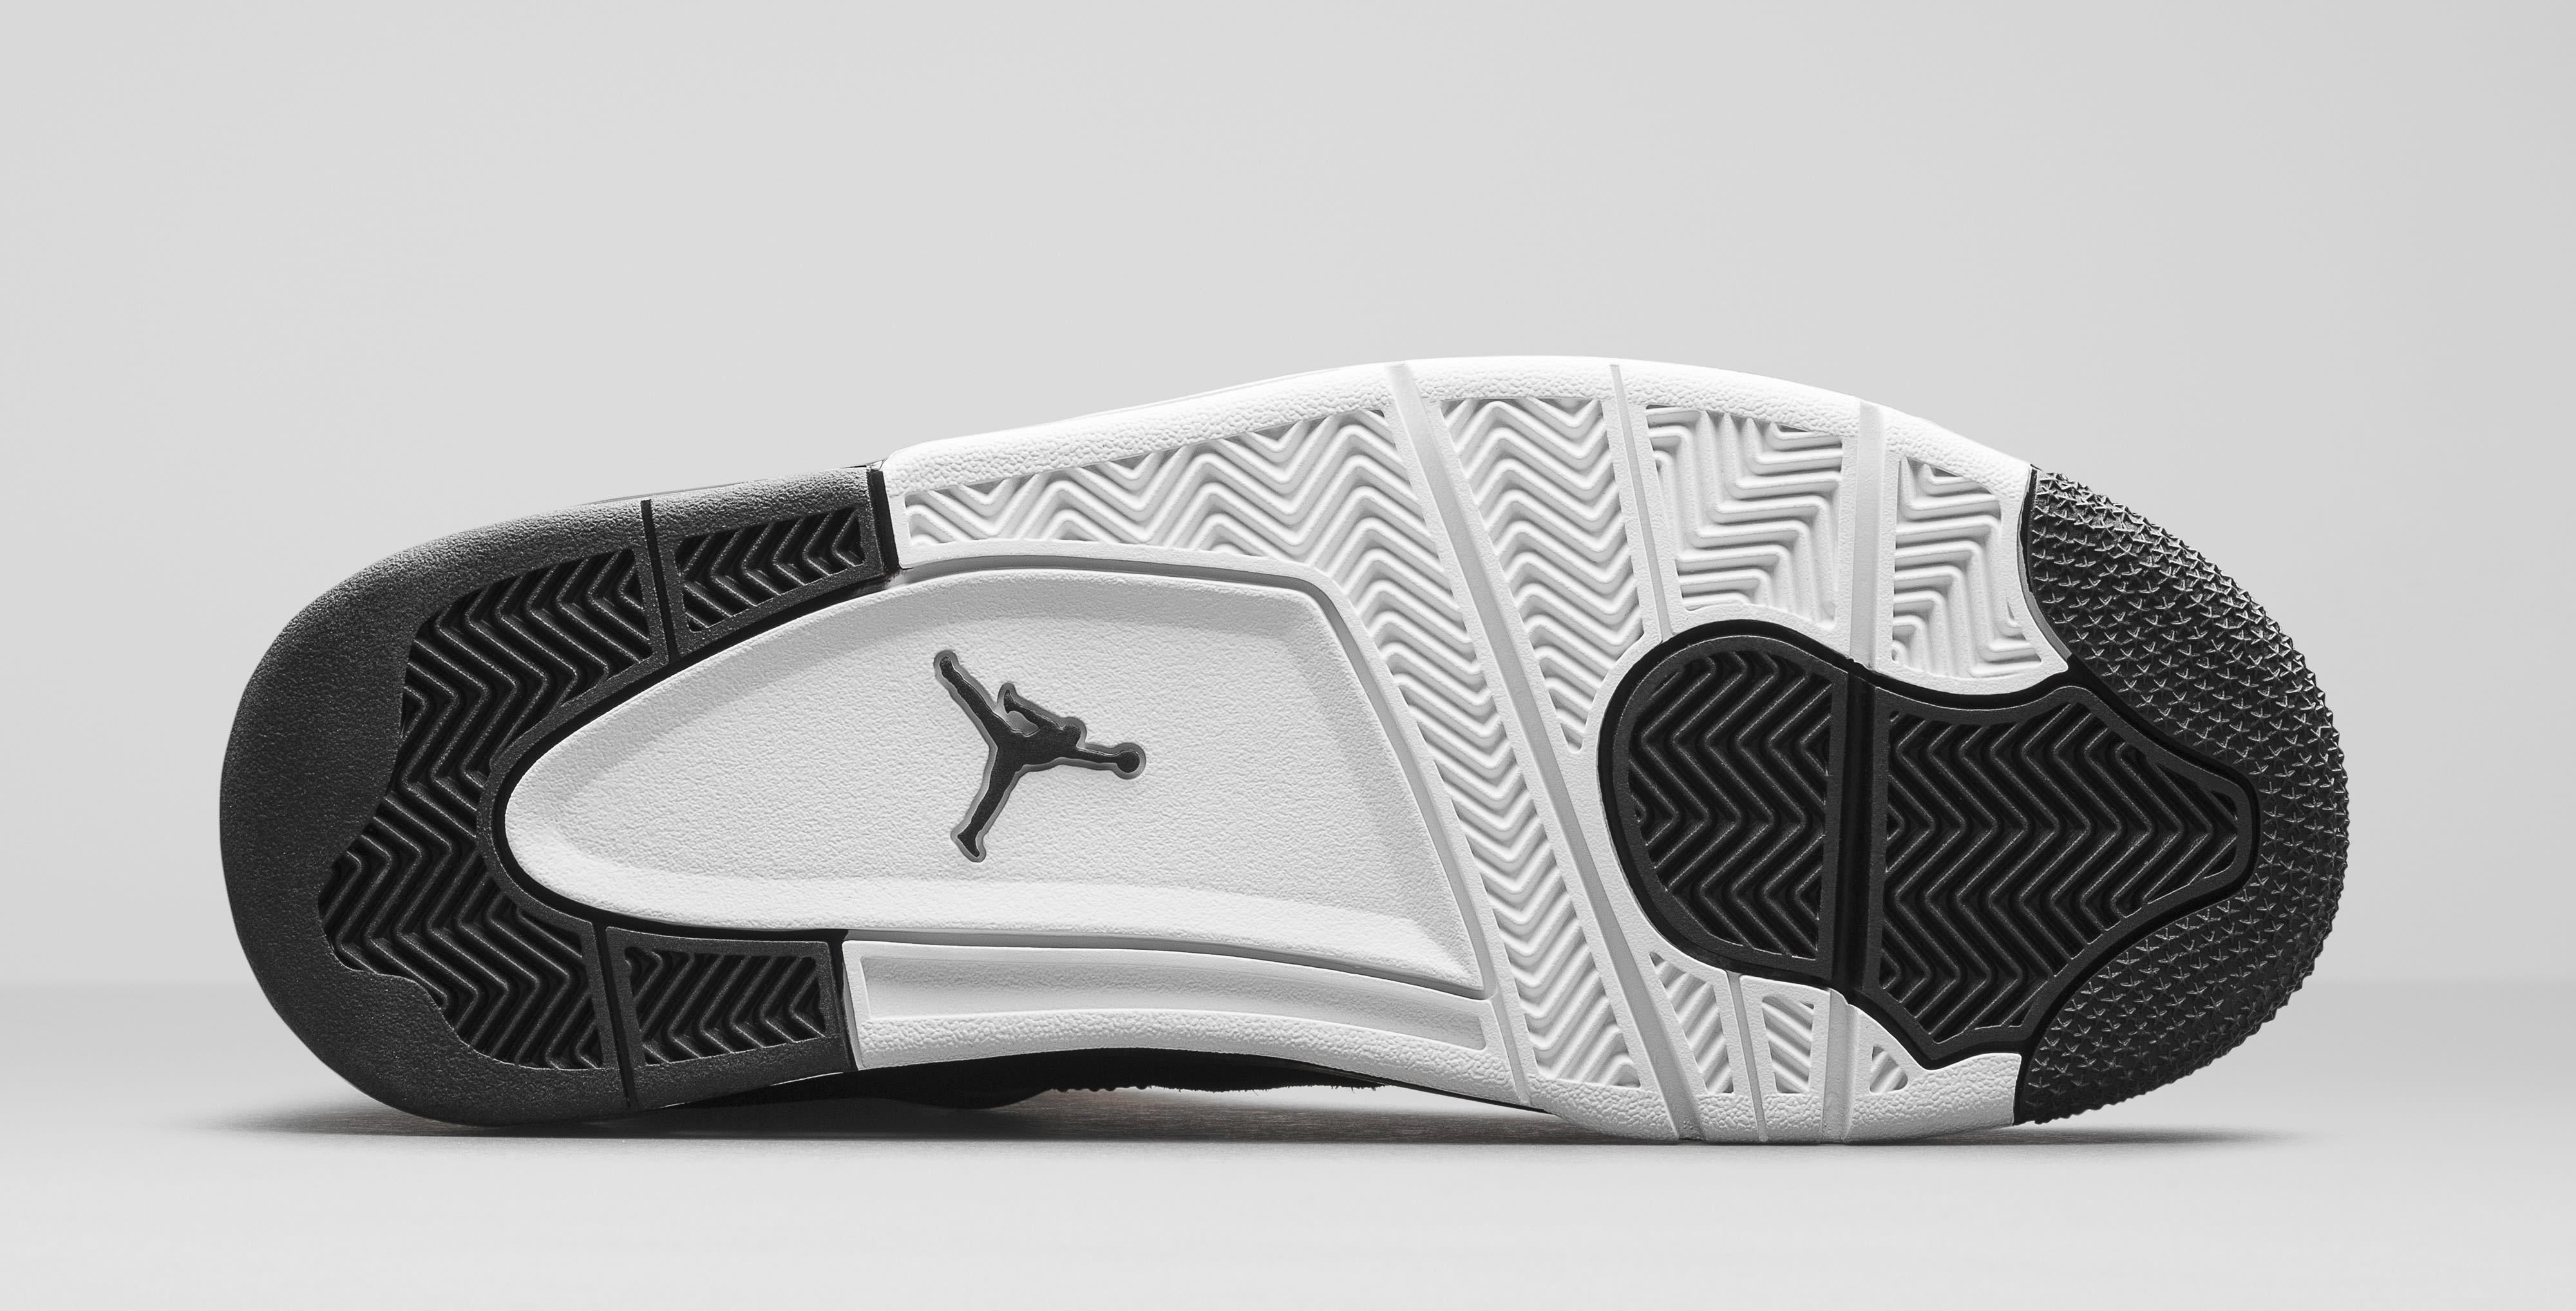 06706a335e75a8 Image via Nike Air Jordan 4 Royalty 308497-032 Sole